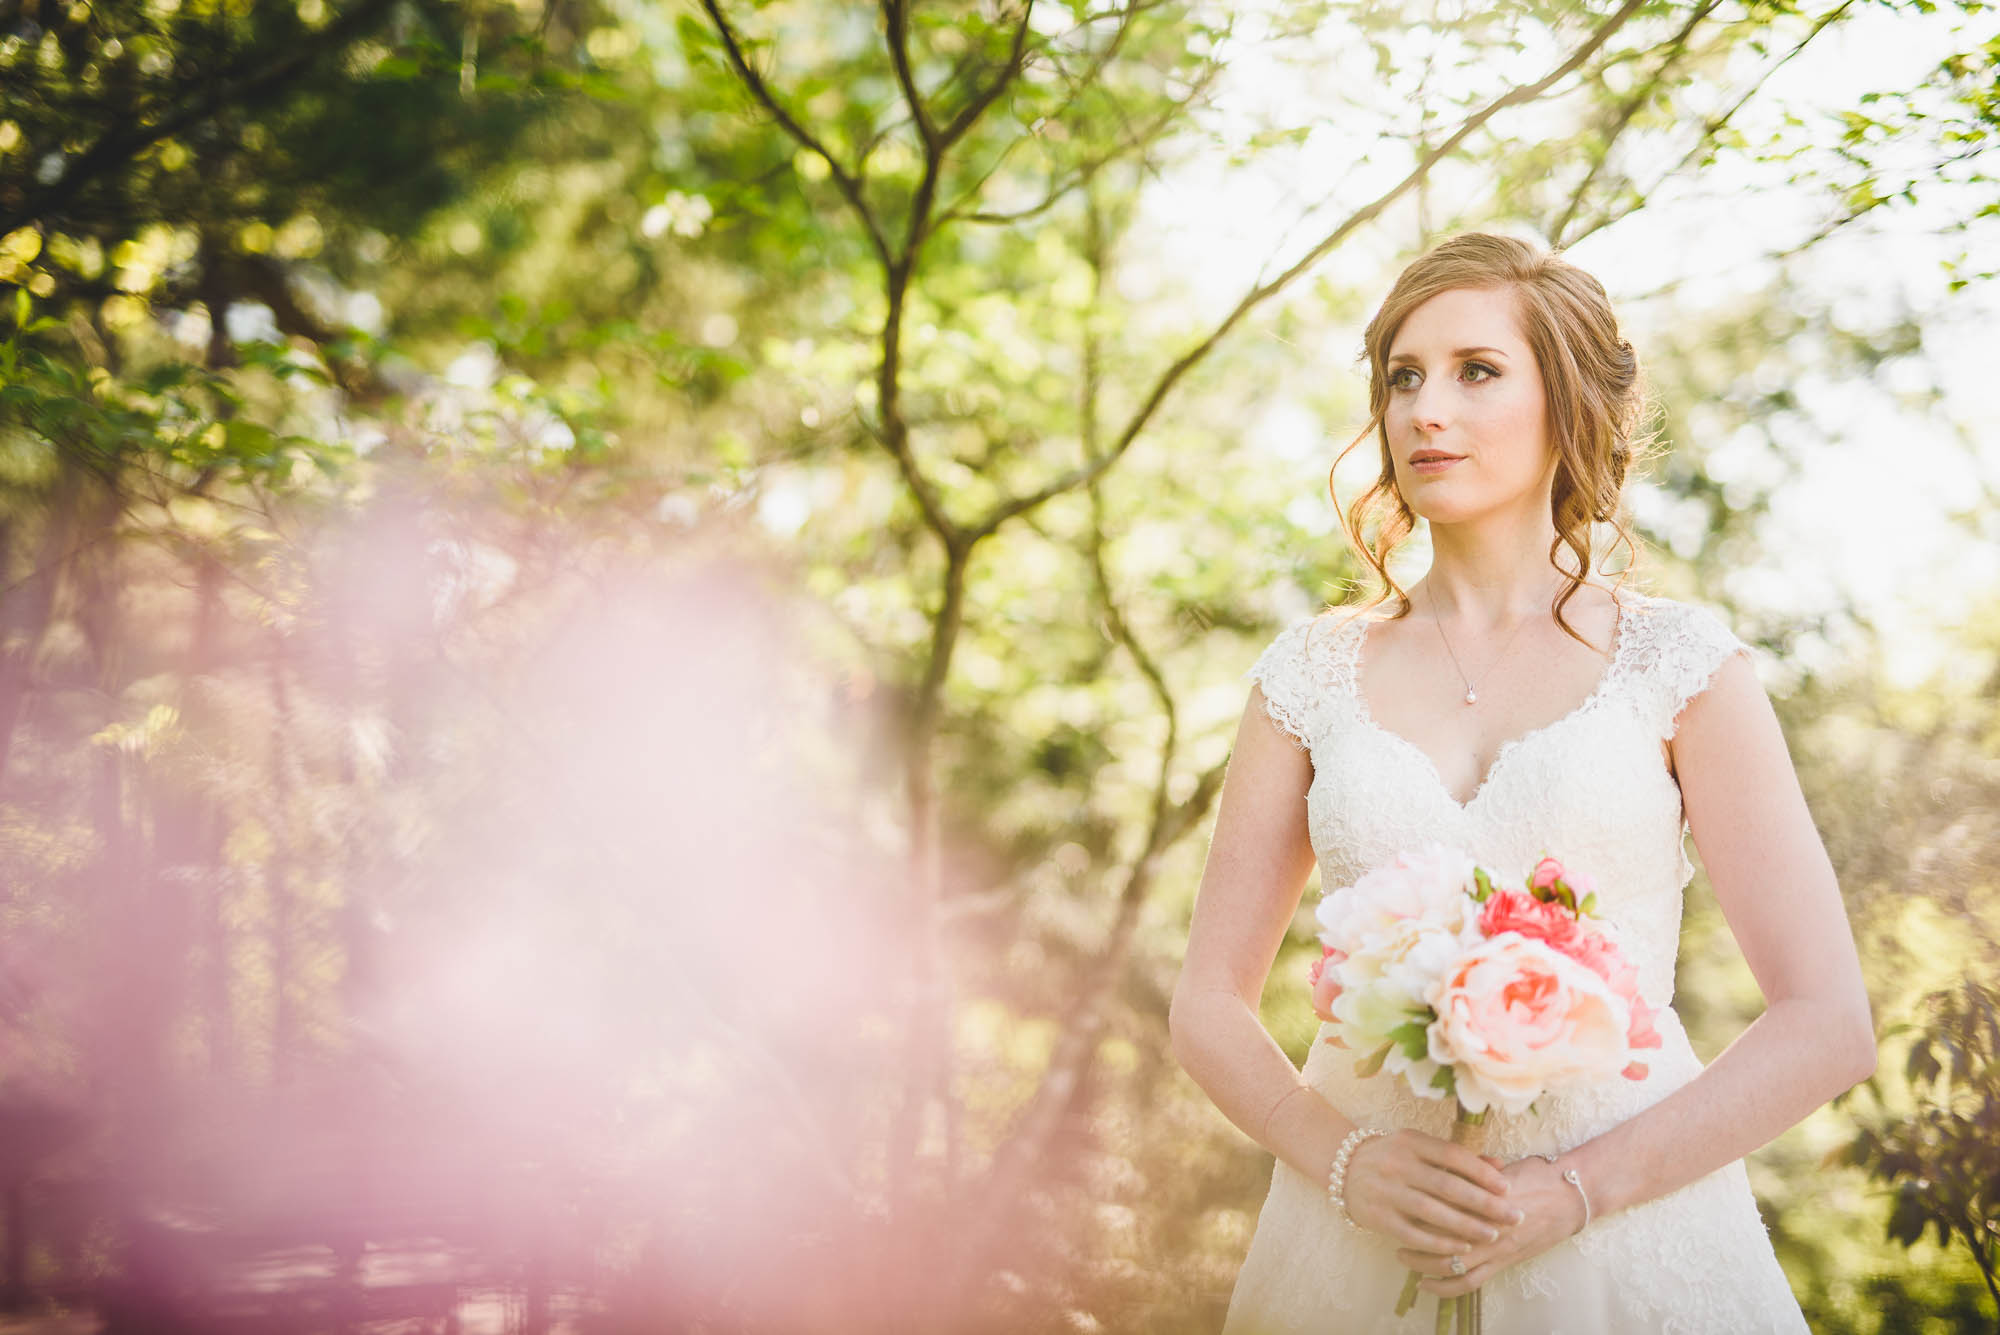 Botanical Gardens bridal